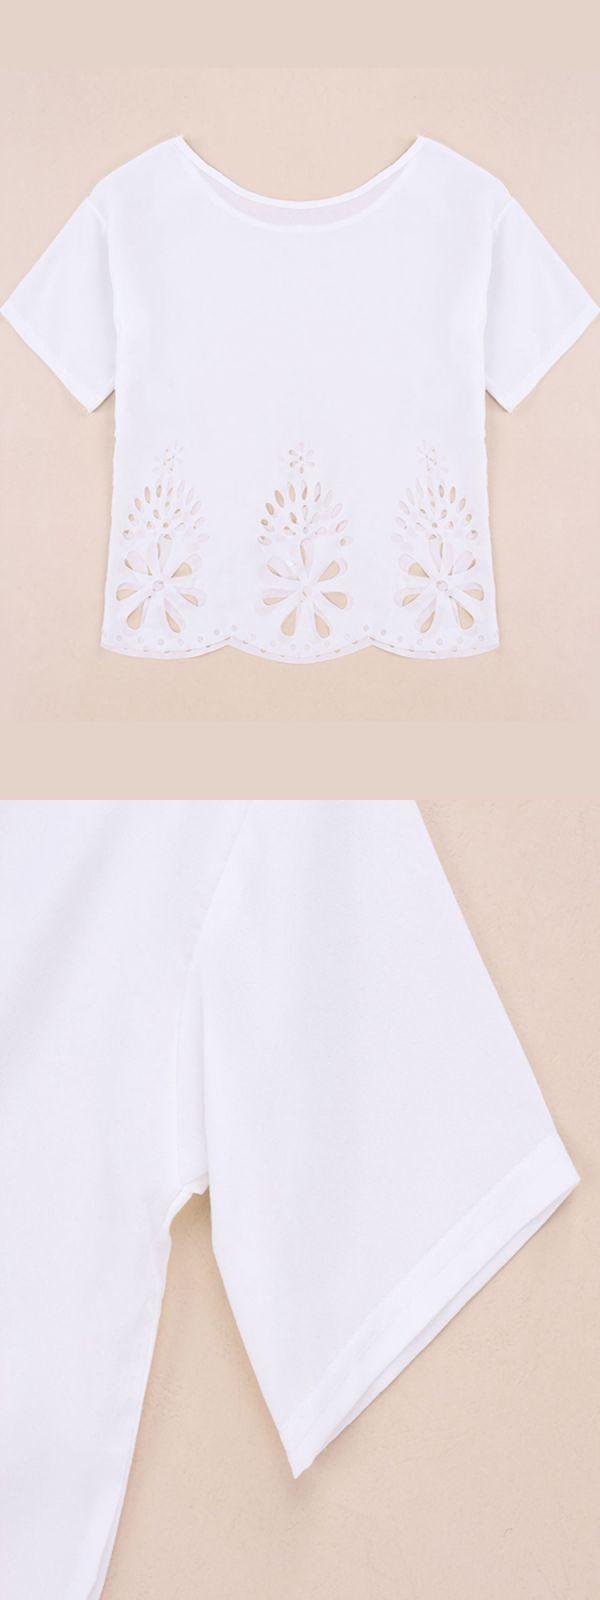 Women#8217;s retro t shirts women casual white short sleeve floral hollow hem loose chiffon t shirt blouse #givenchy #t #shirt #dog #woman #long #tail #t #shirts #womens #t-shirt #quotes #girl #vince #t #shirts #womens